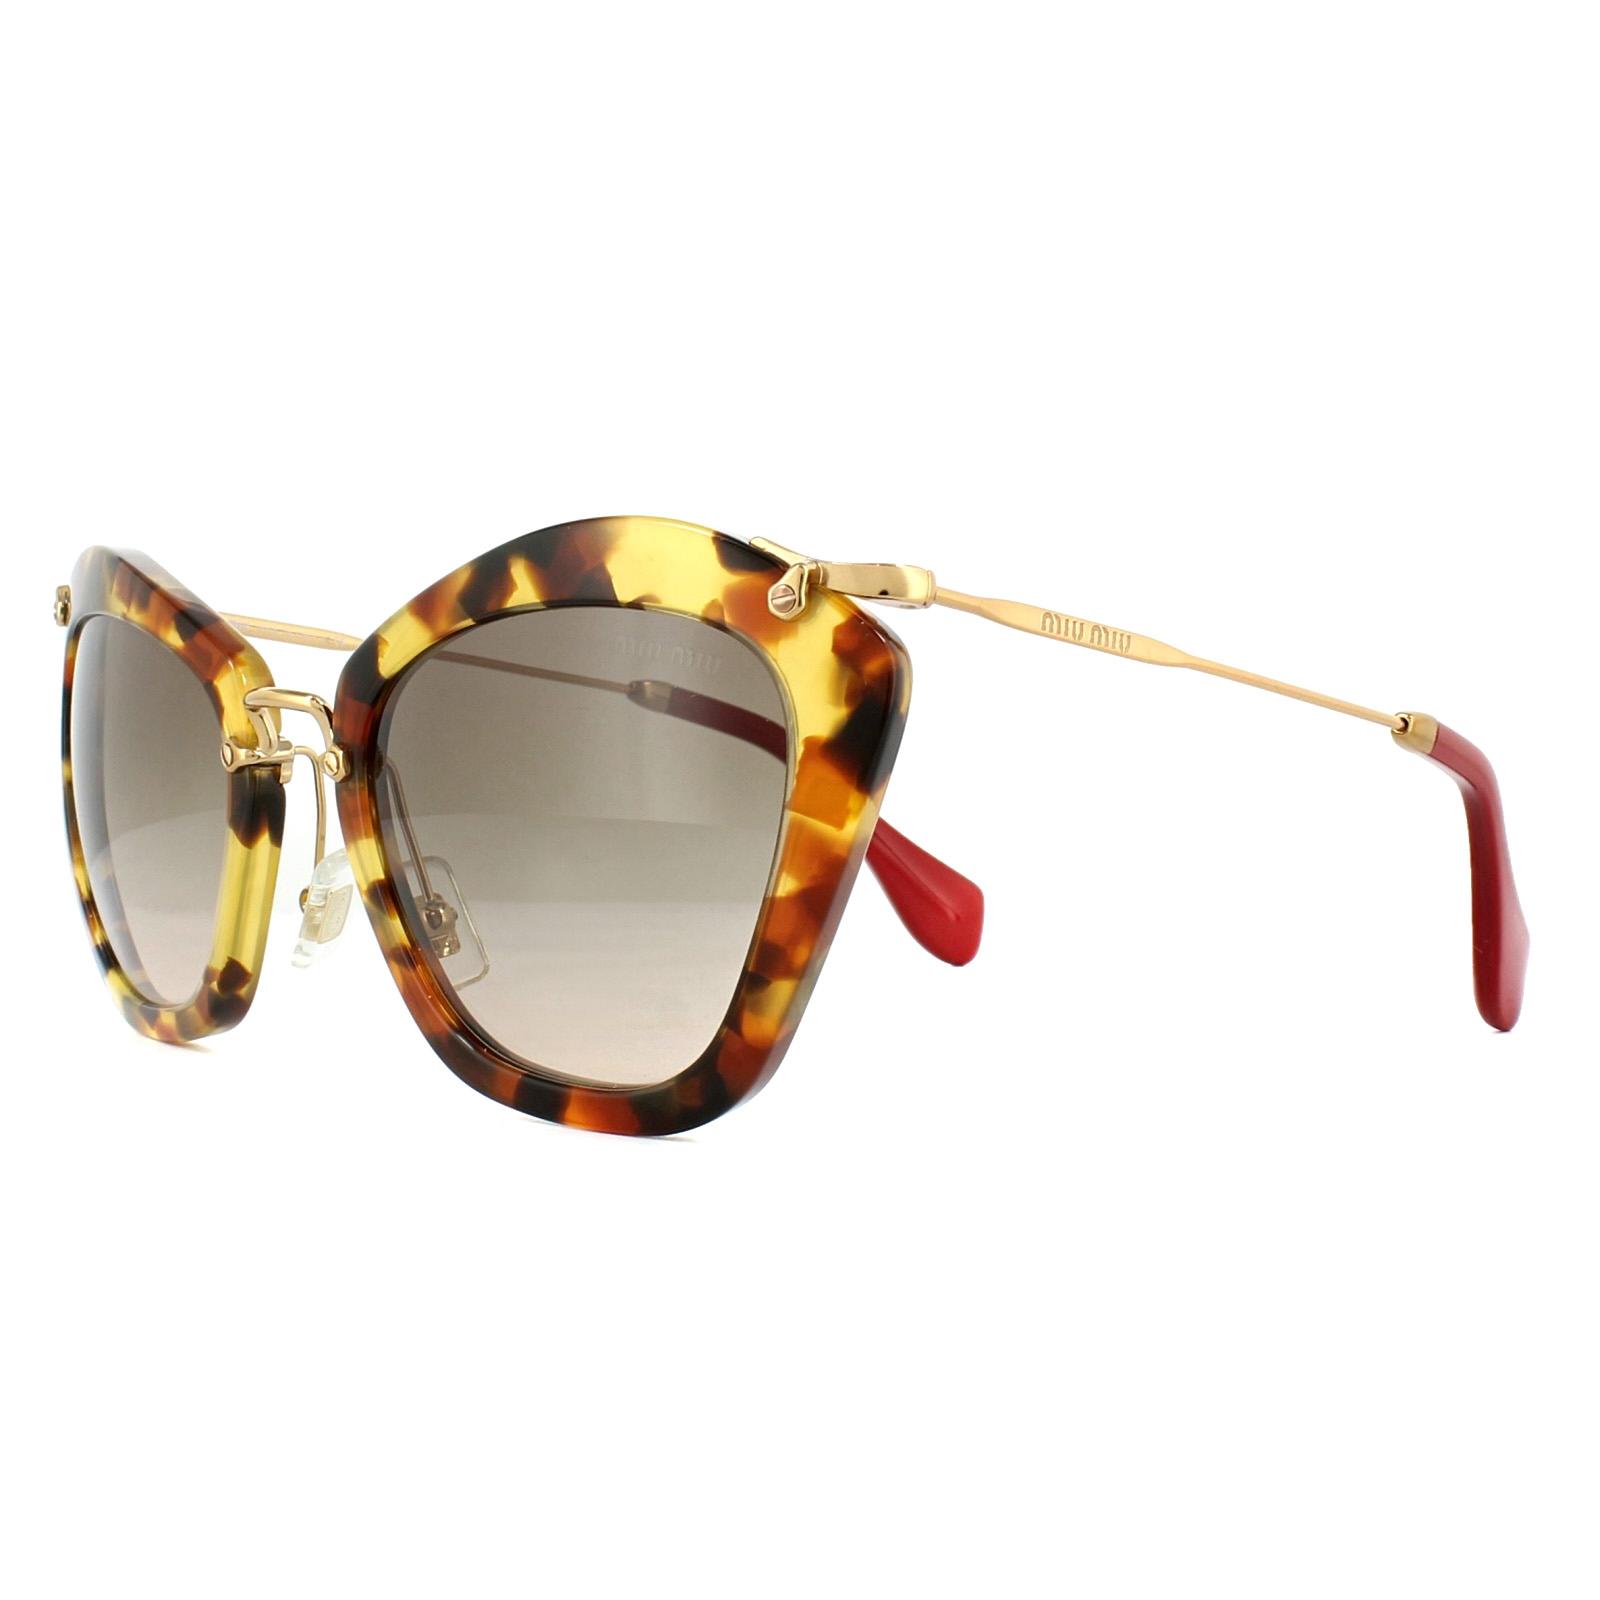 6875919d2b7 Sentinel Miu Miu Sunglasses 10NS UBR3D0 Light Havana Gold Brown Gradient